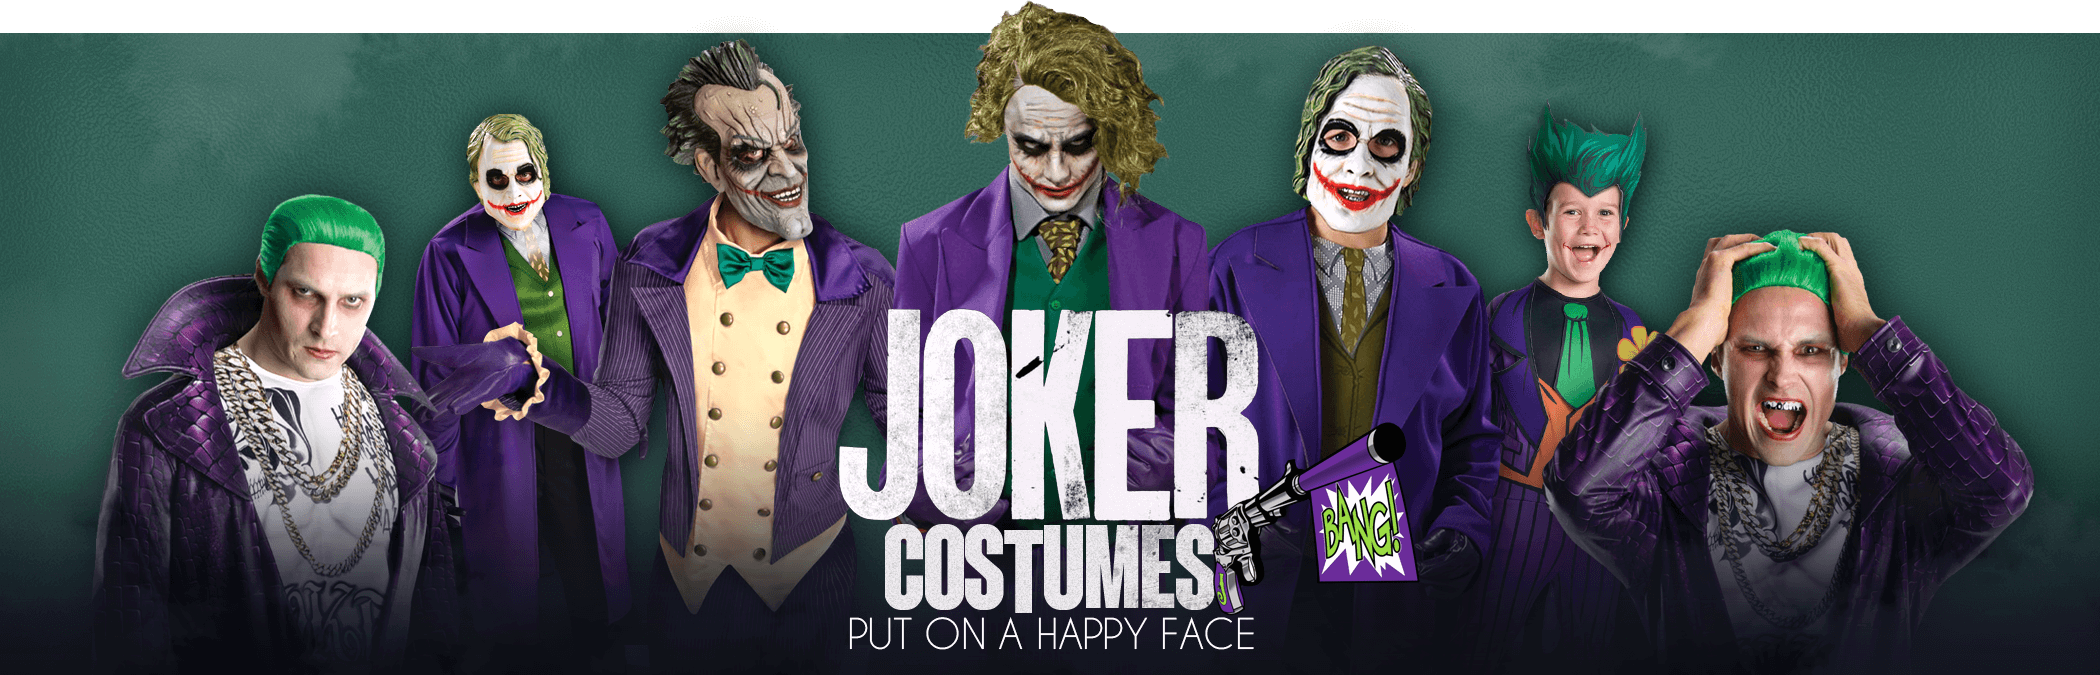 Joker Costumes